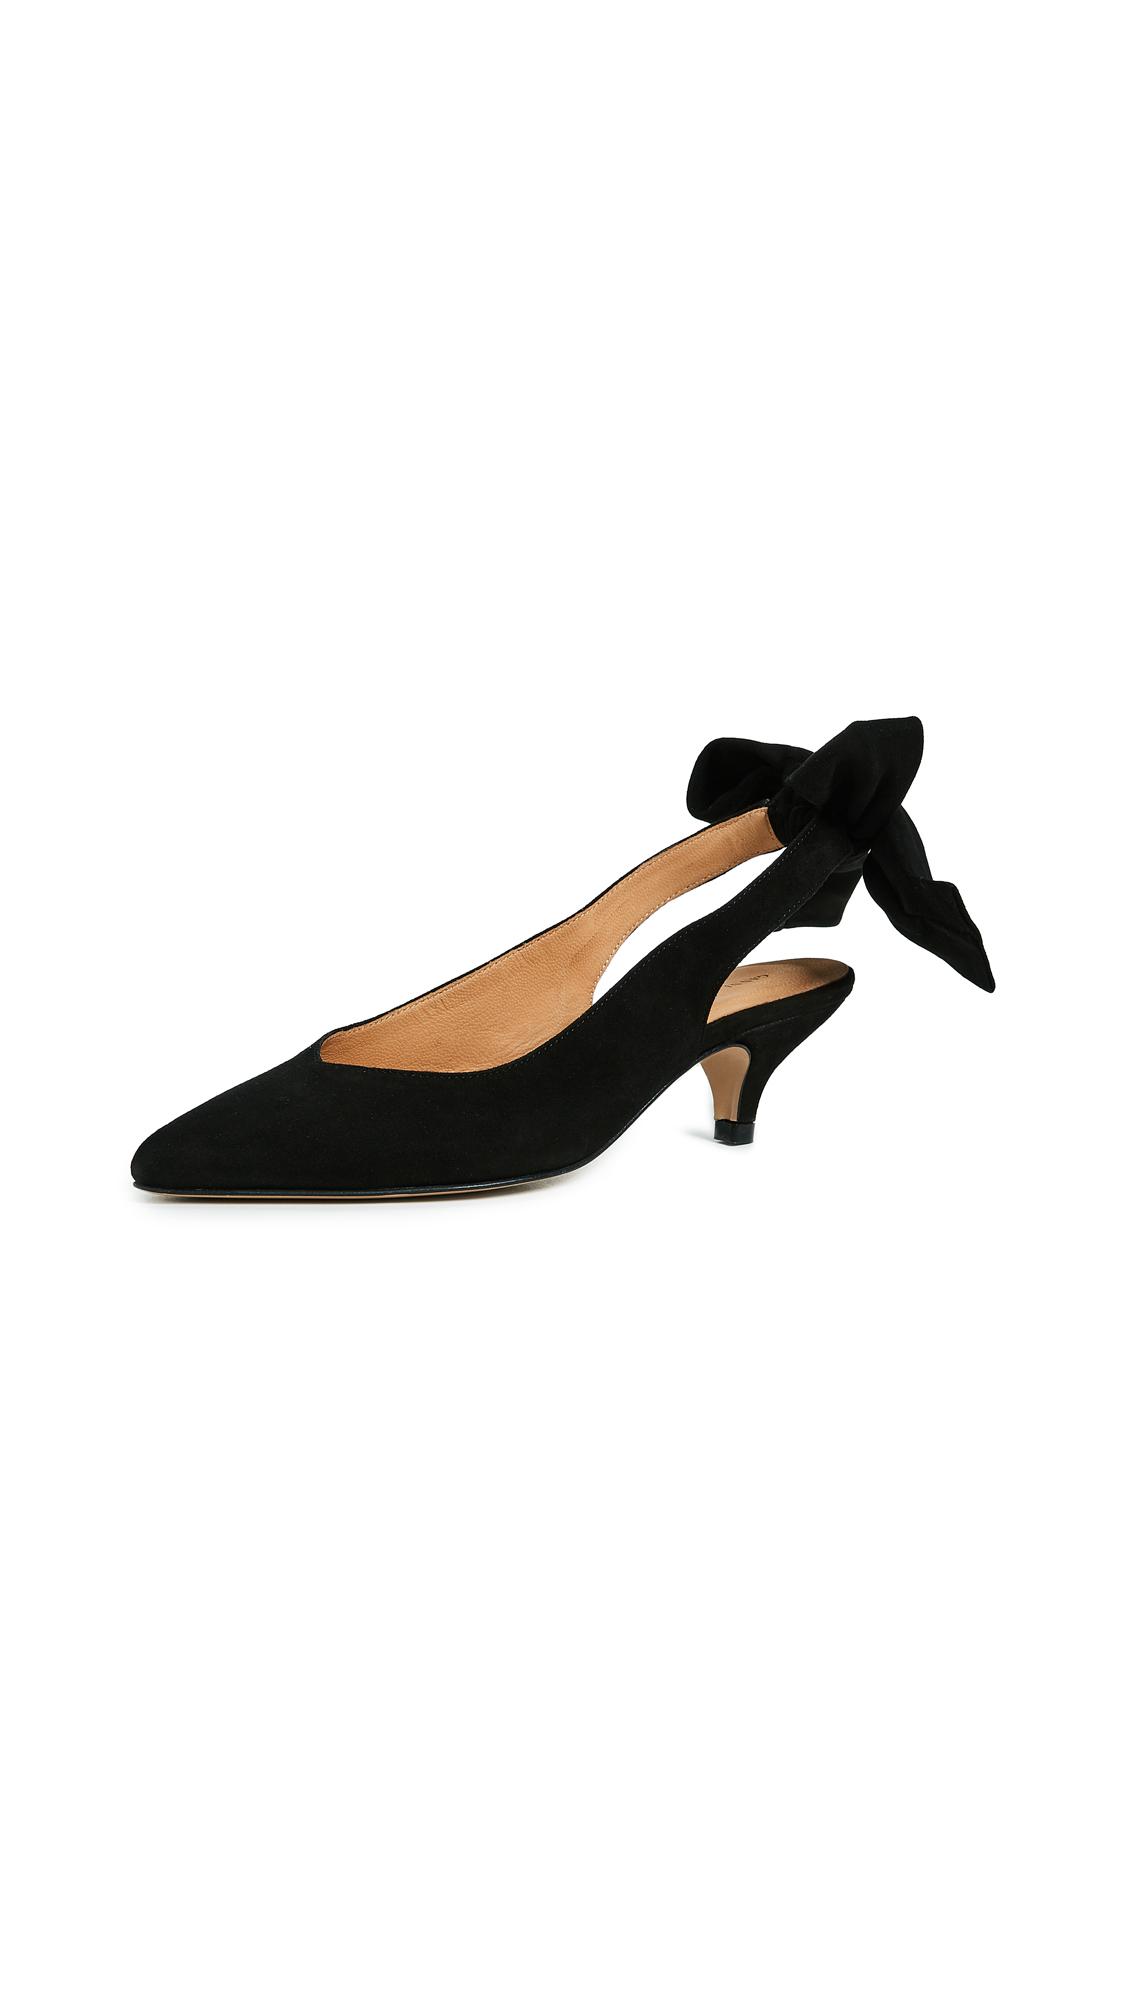 GANNI Bow Kitten Heels - Black